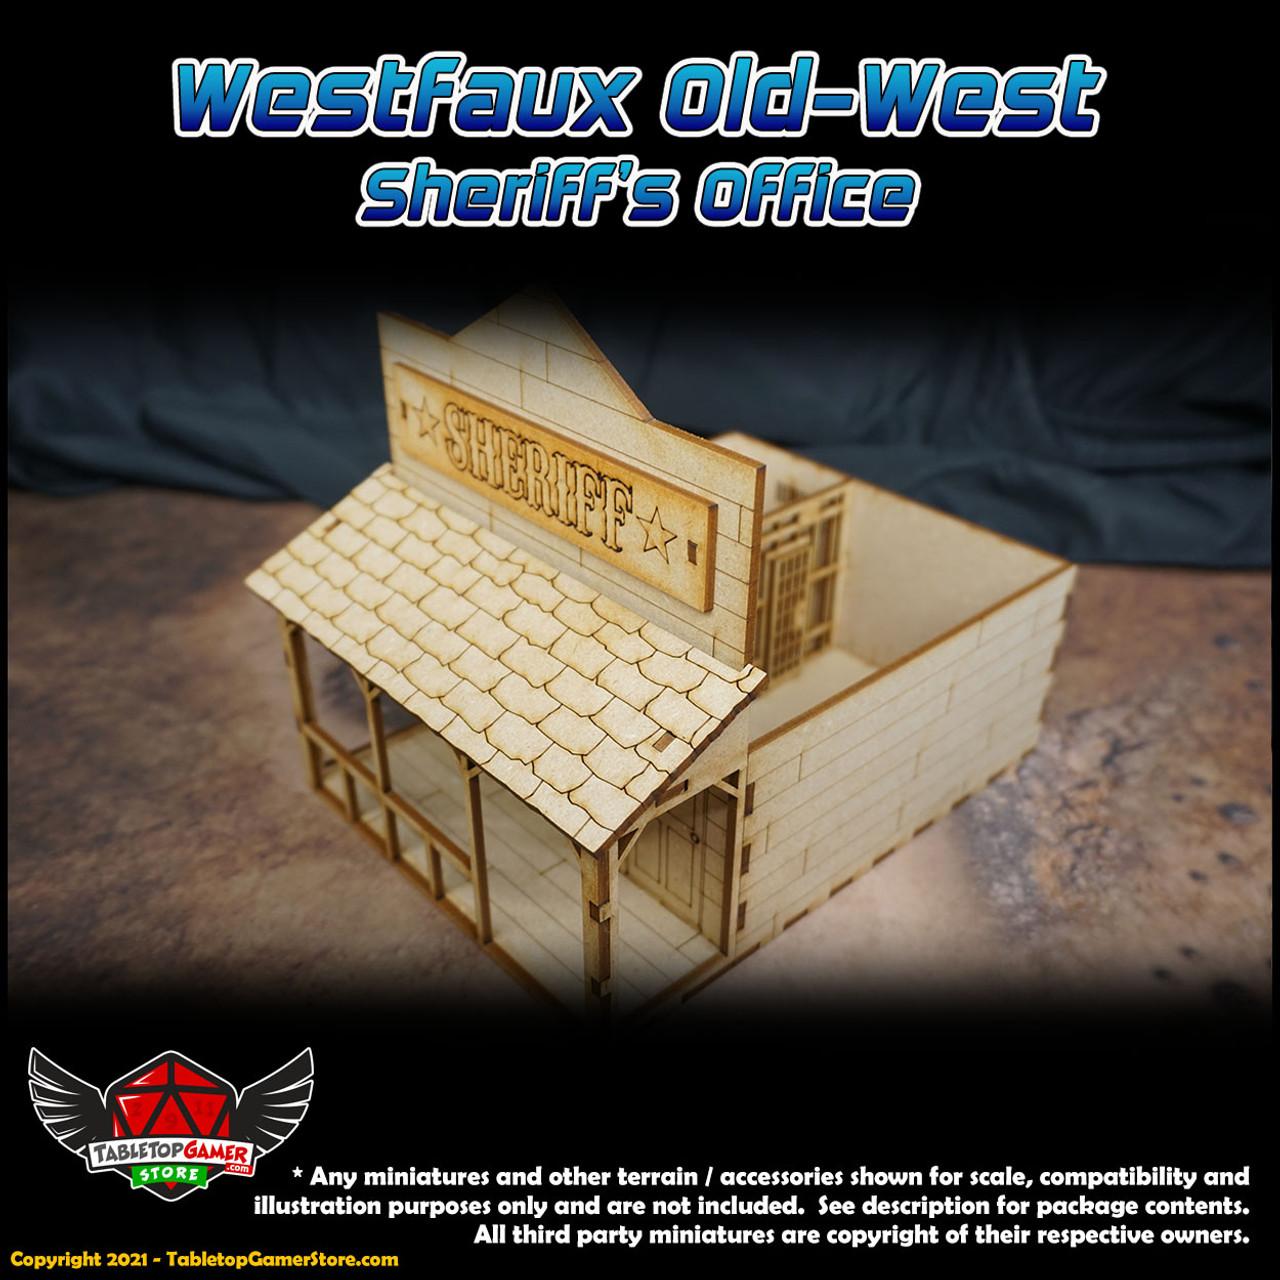 Westfaux Old-West Sheriff's Office